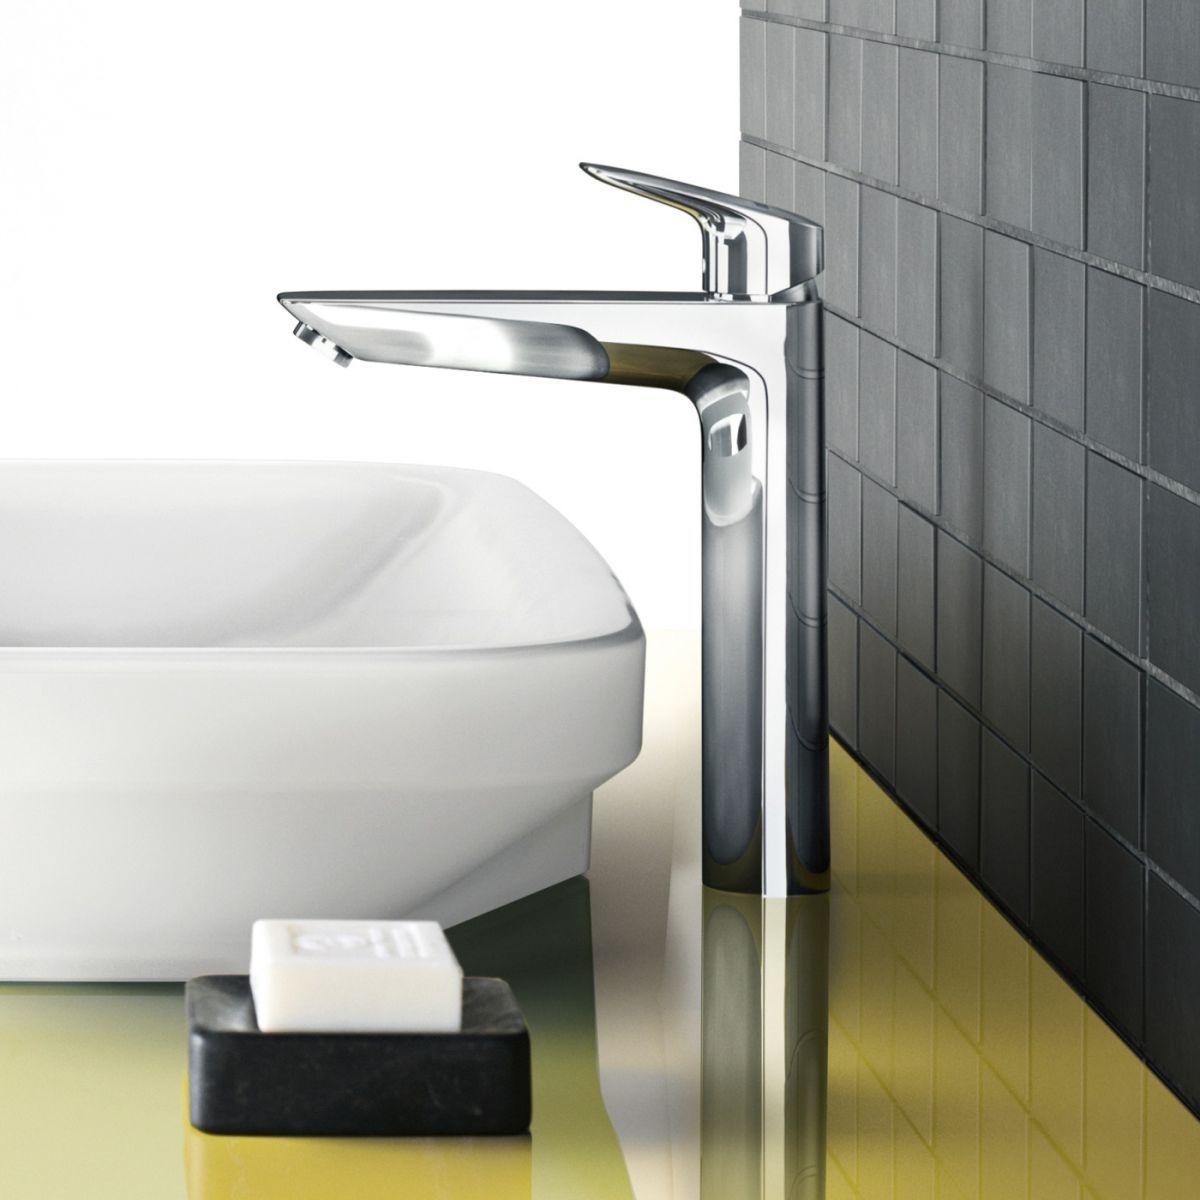 Hansgrohe Logis 190 Tall Basin Mixer Basin Bathroom Basin